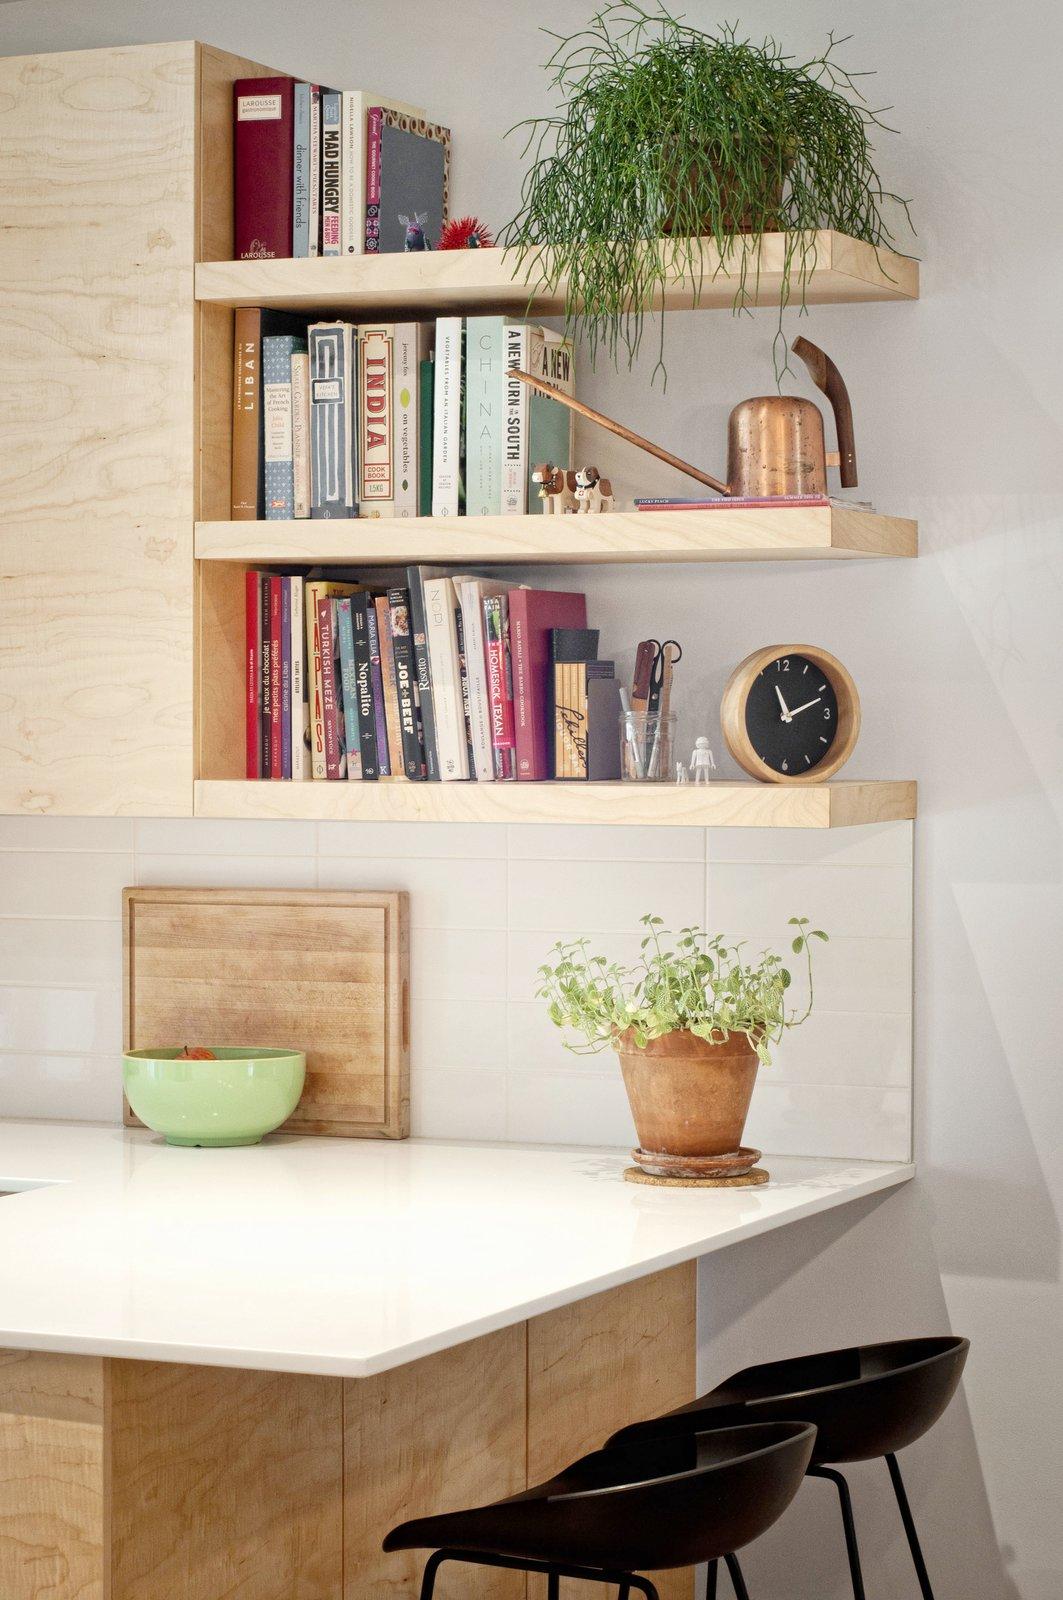 Tagged: Kitchen, Engineered Quartz Counter, Wood Cabinet, and Ceramic Tile Backsplashe.  Fabre Residence by Jonathan Dorthe